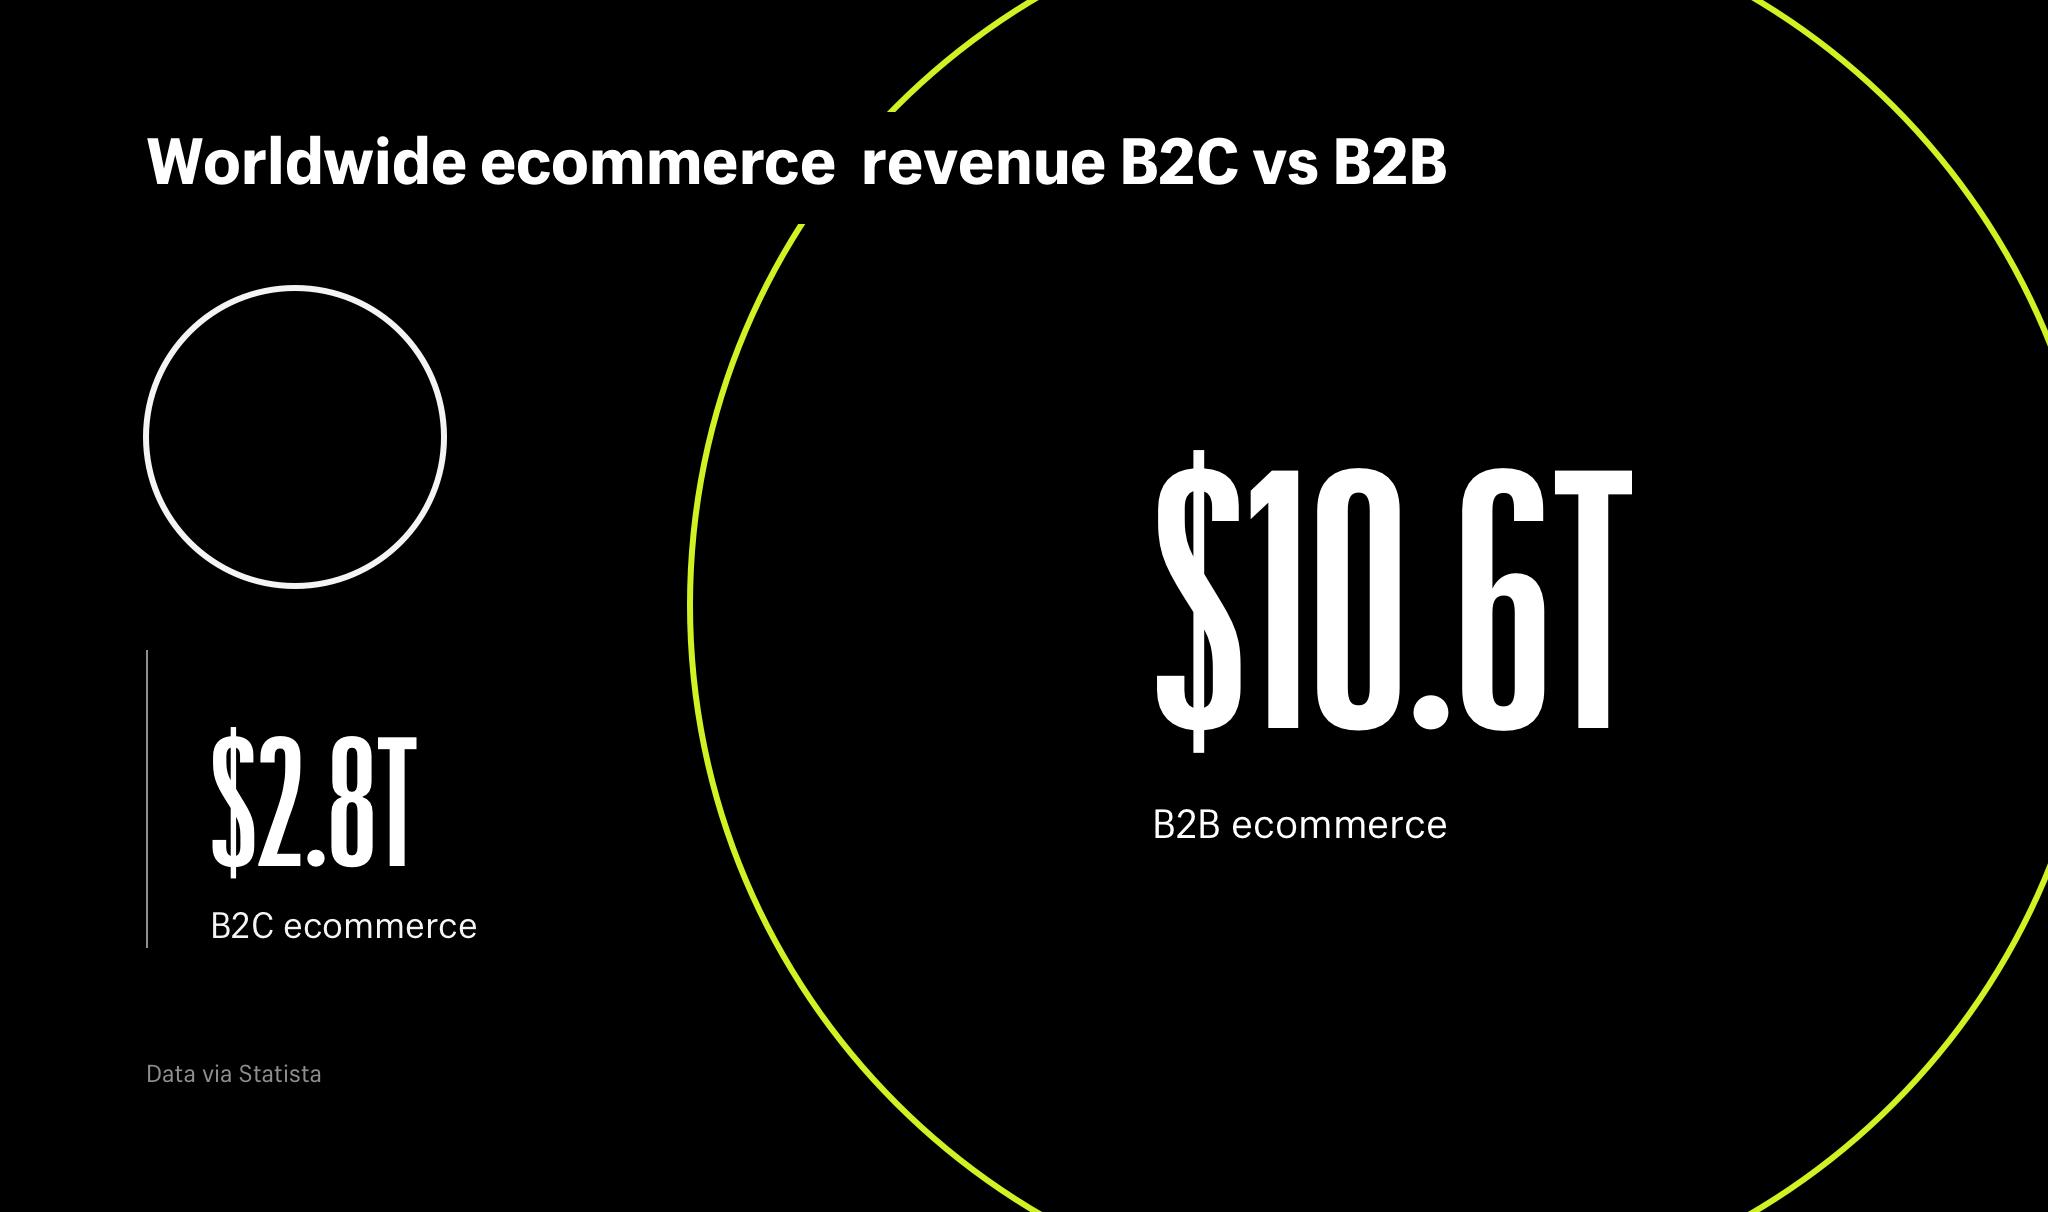 b2b frente a b2c